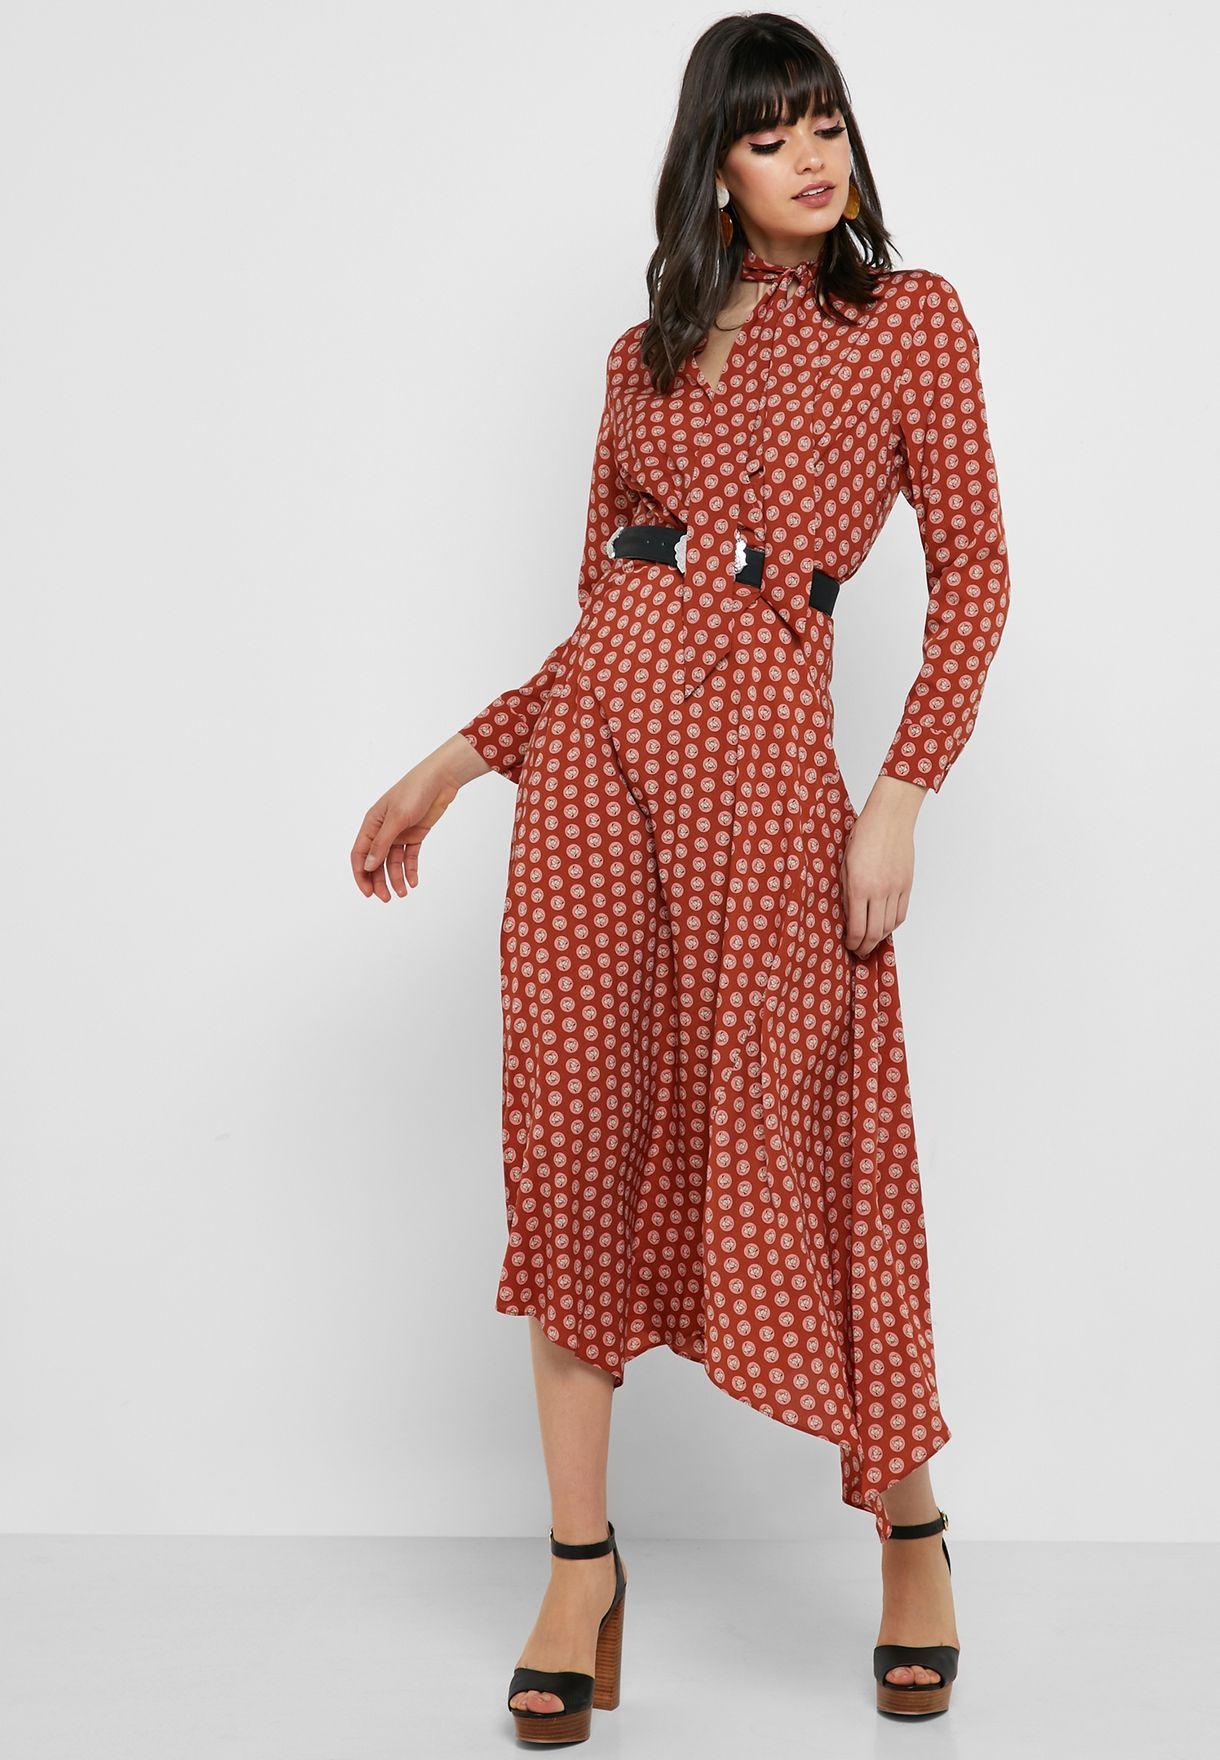 fe258f2805b9 Shop Topshop prints Tie Neck Polka Dot Dress 10K21QRST for Women in ...